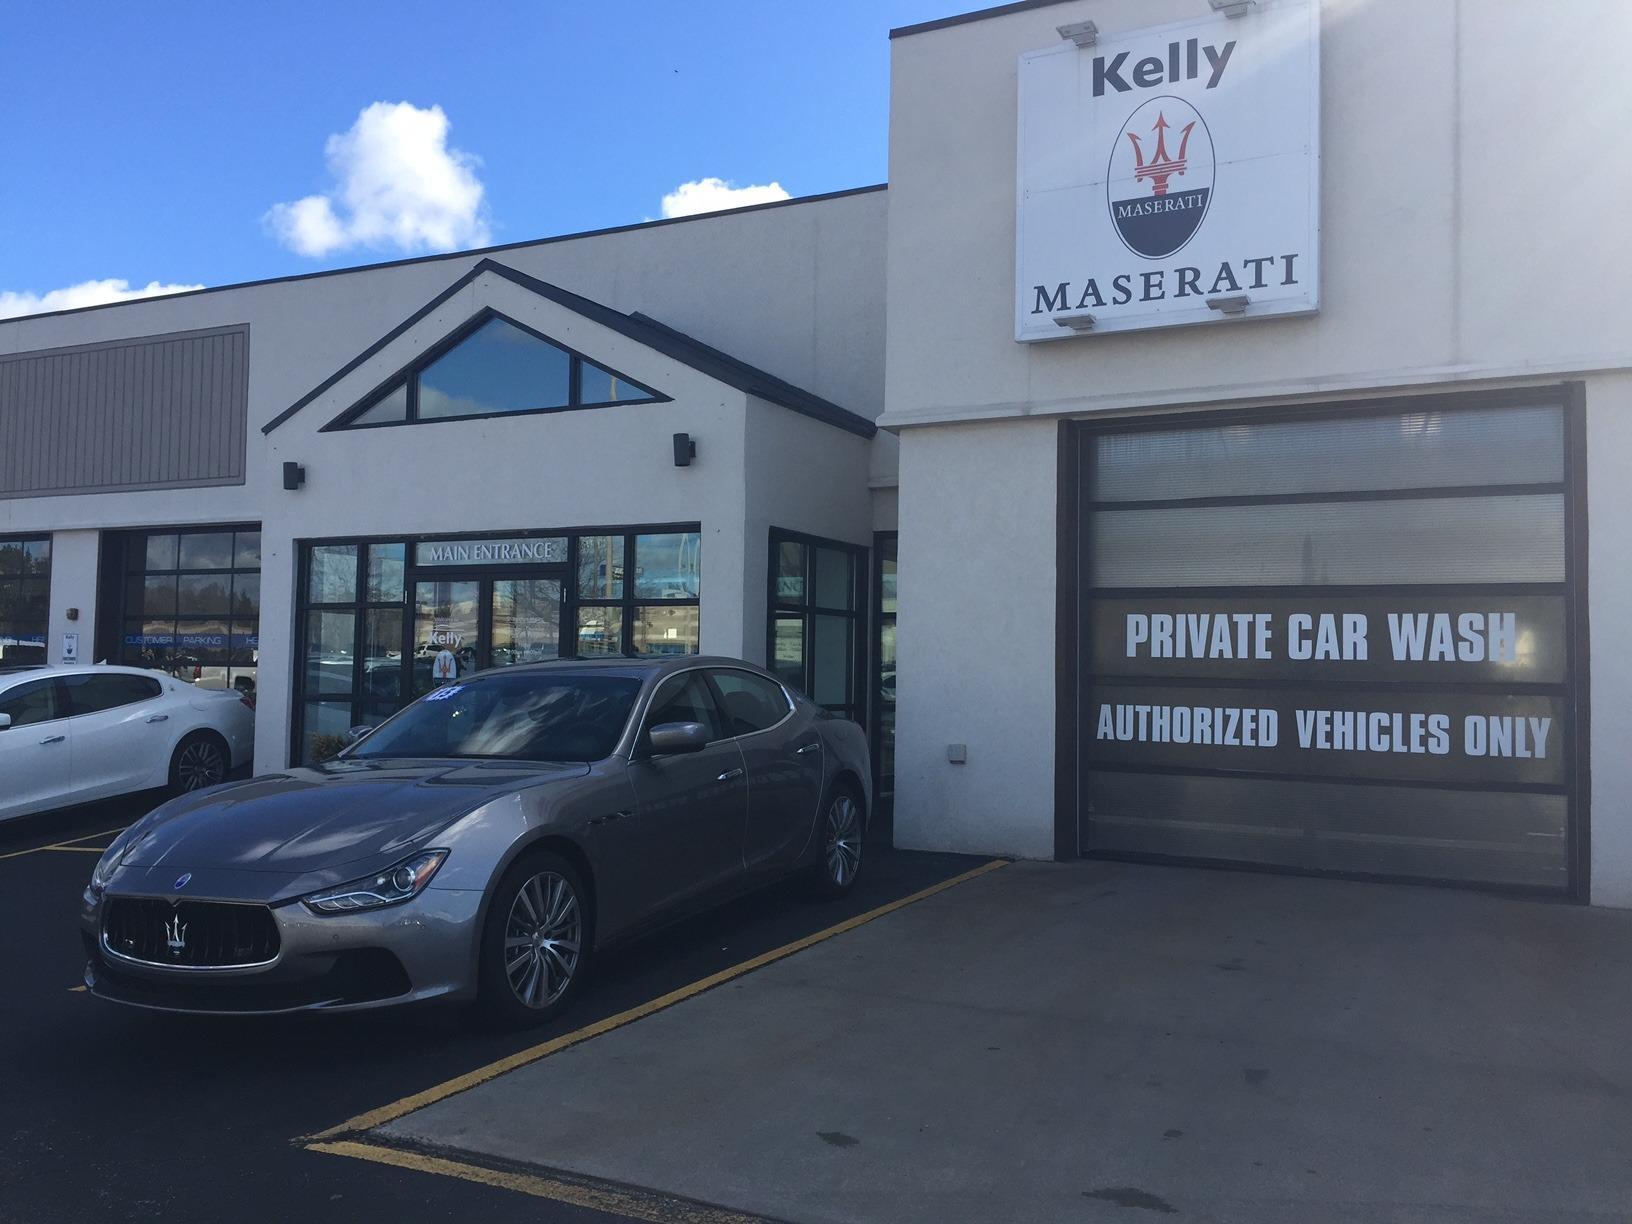 Kelly Maserati - CLOSED image 1